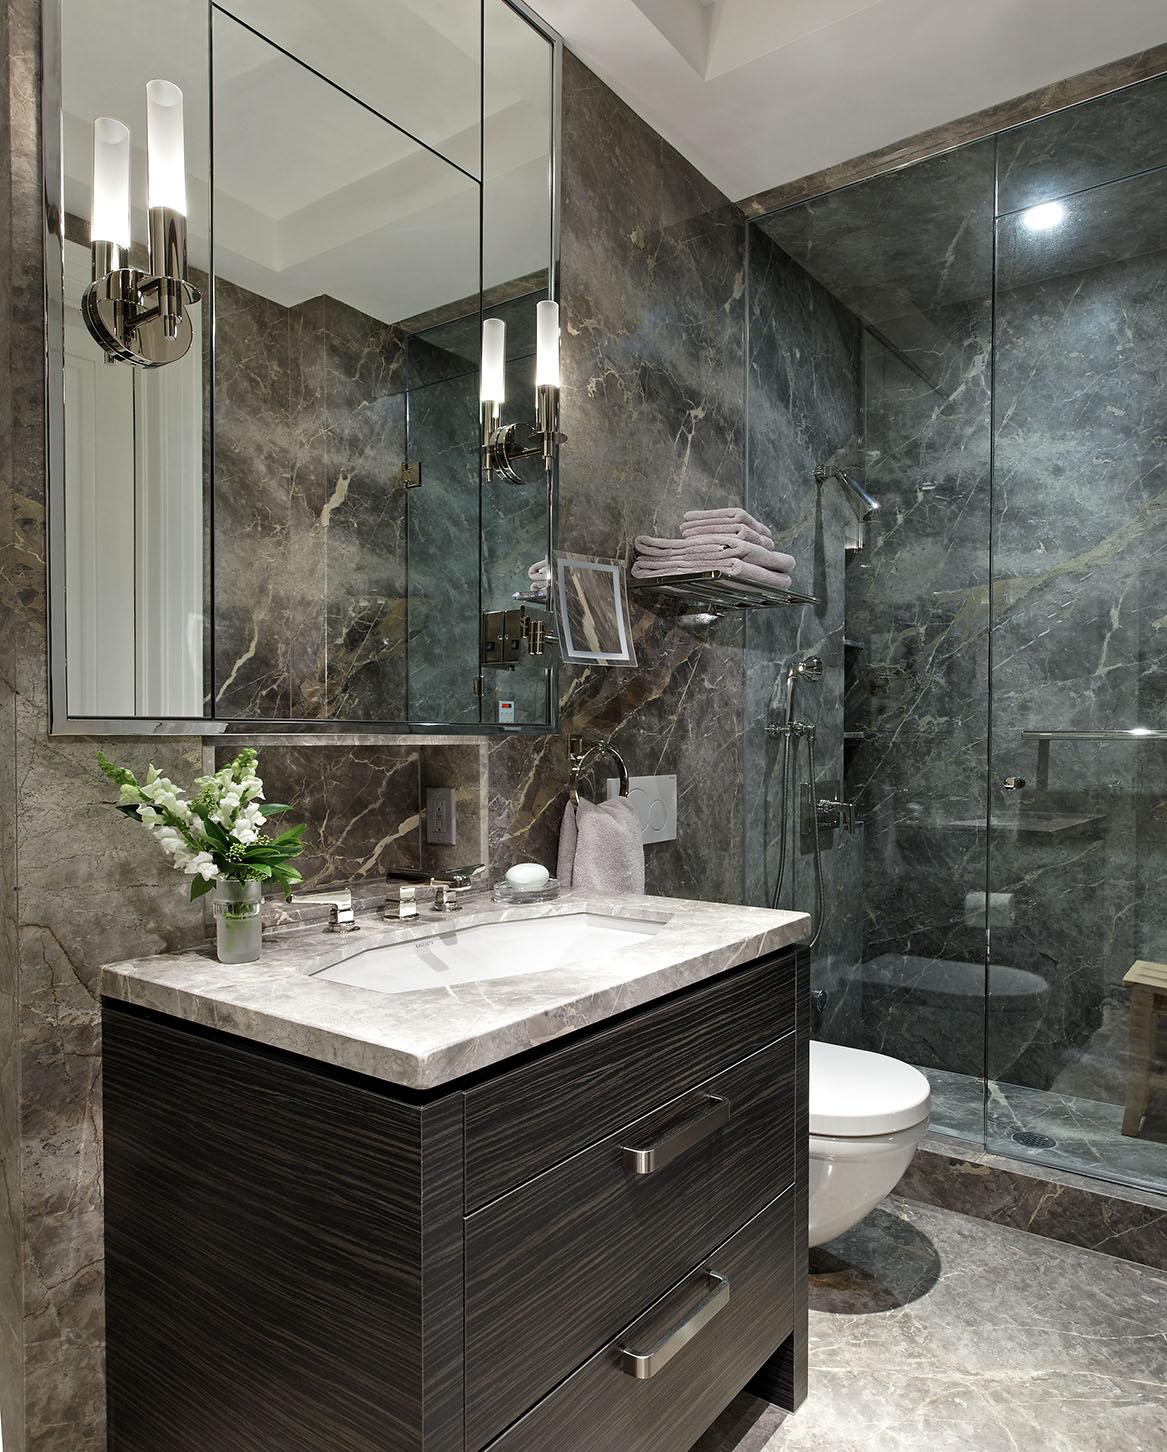 41_Bathroom.jpg